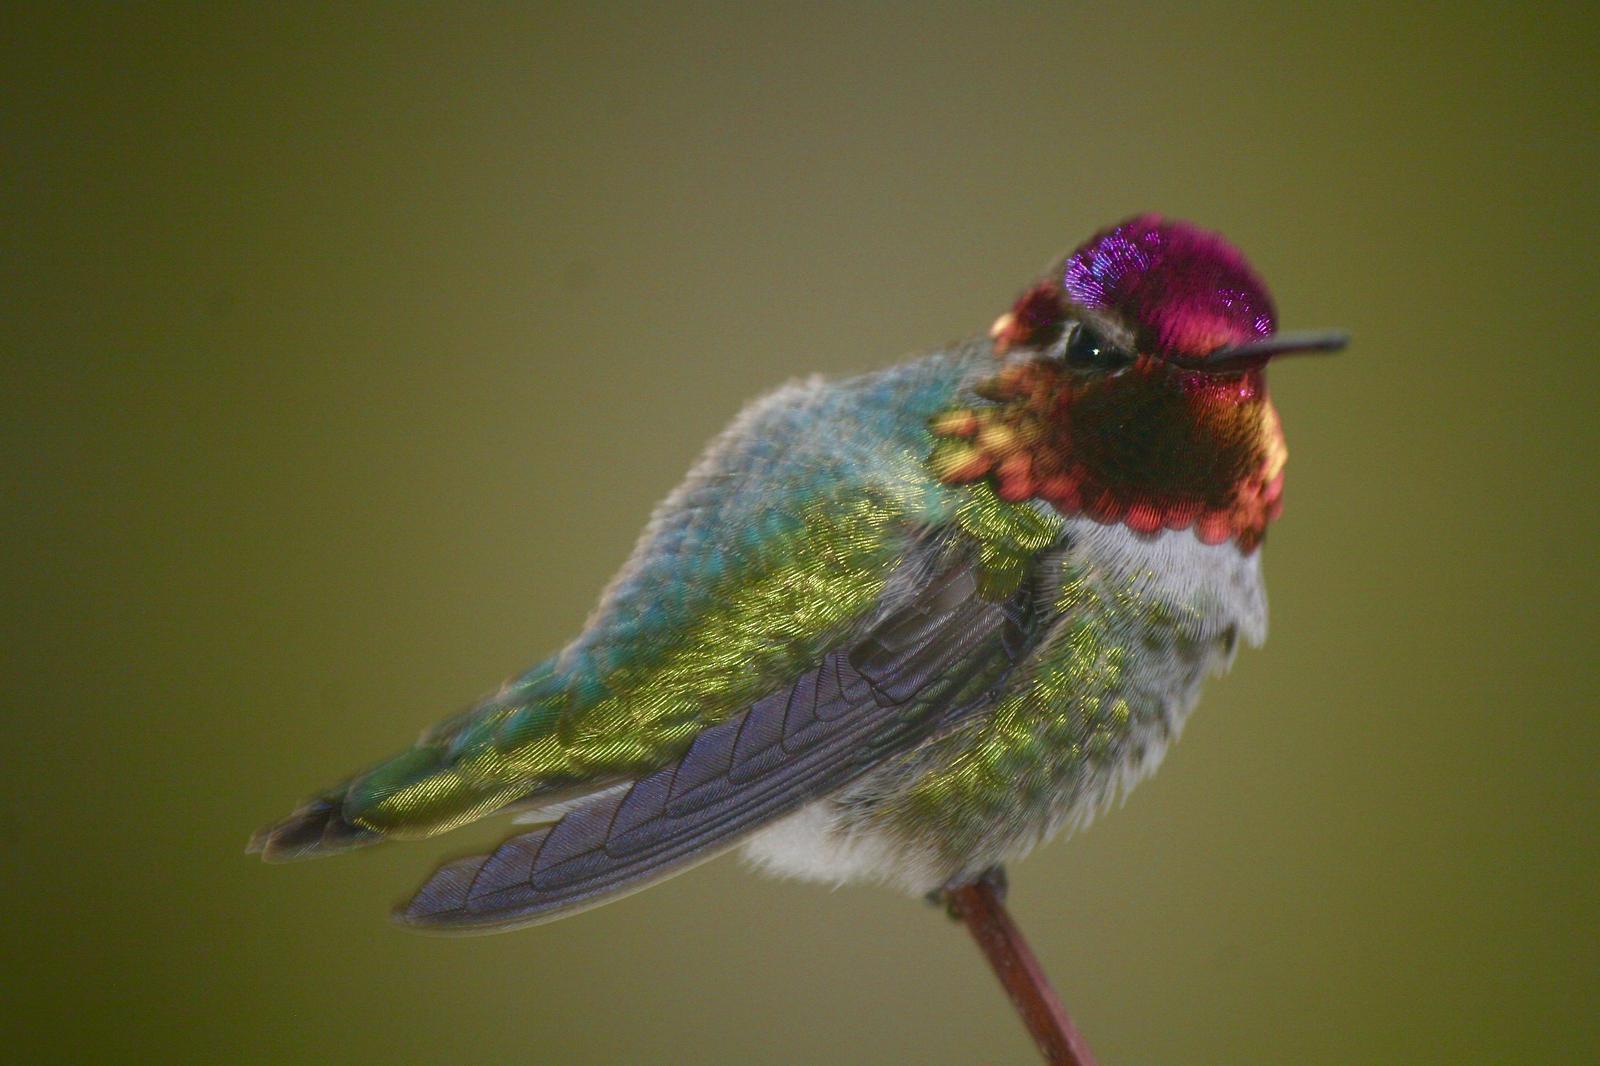 Anna's Hummingbird Photo by Ted Goshulak